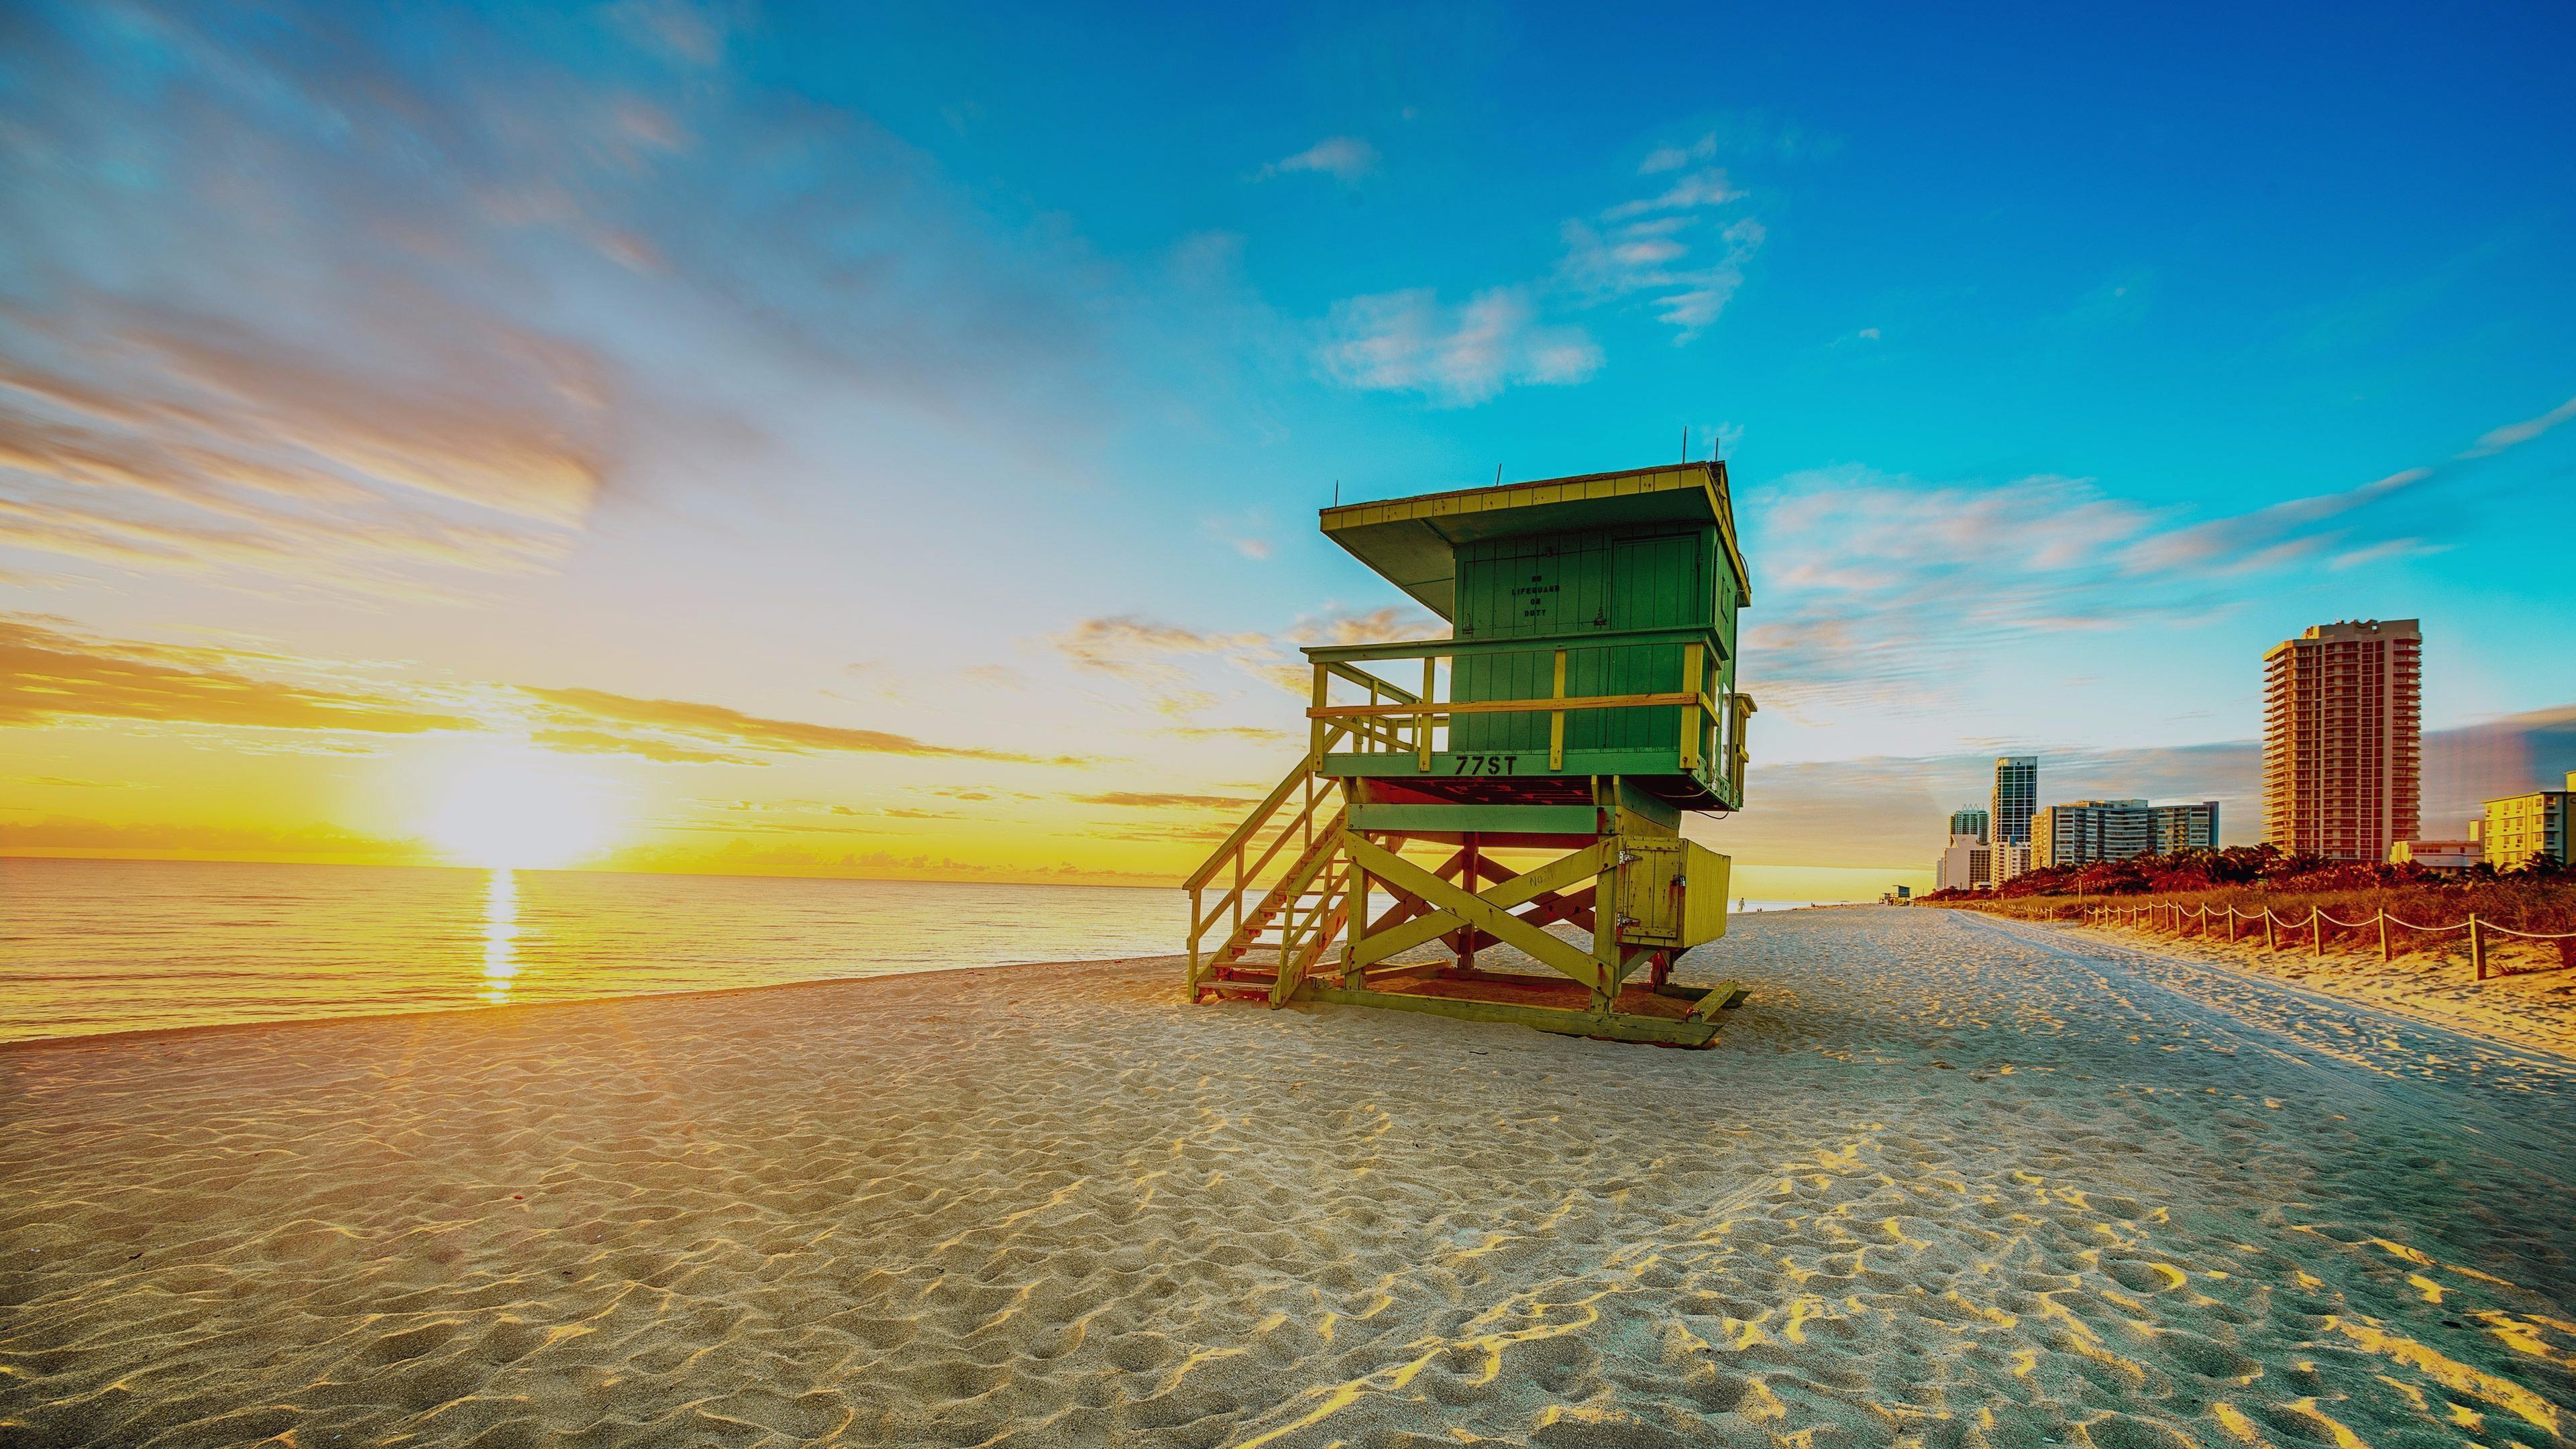 Hotline Miami Iphone Wallpaper Miami Beach Wallpapers 183 ①